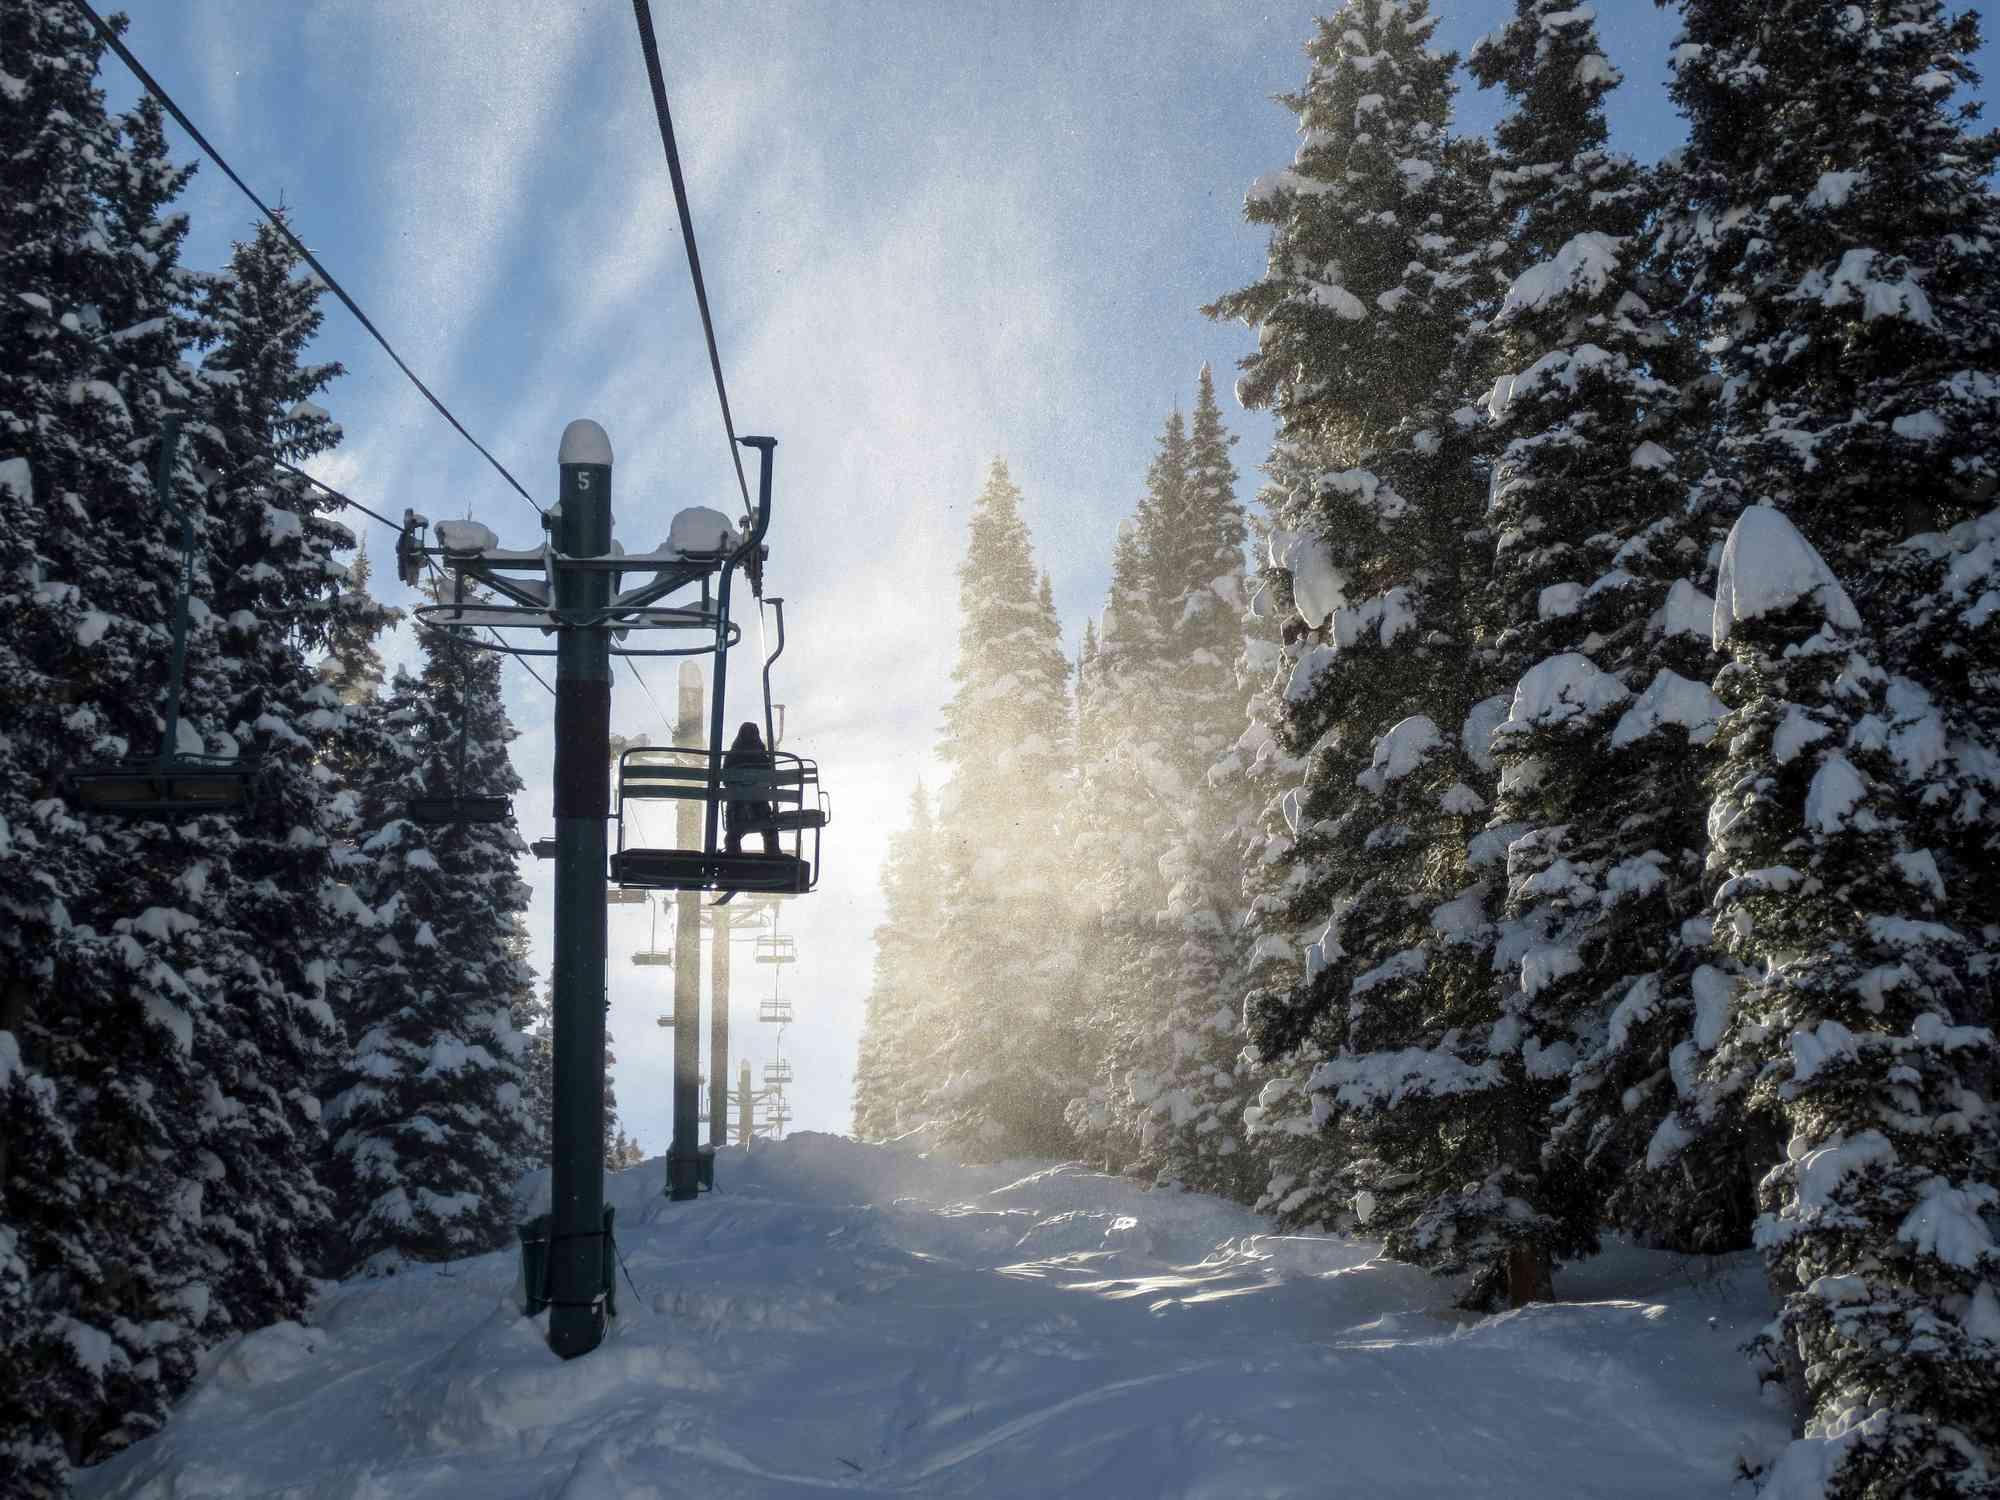 Ski lifts in Colorado